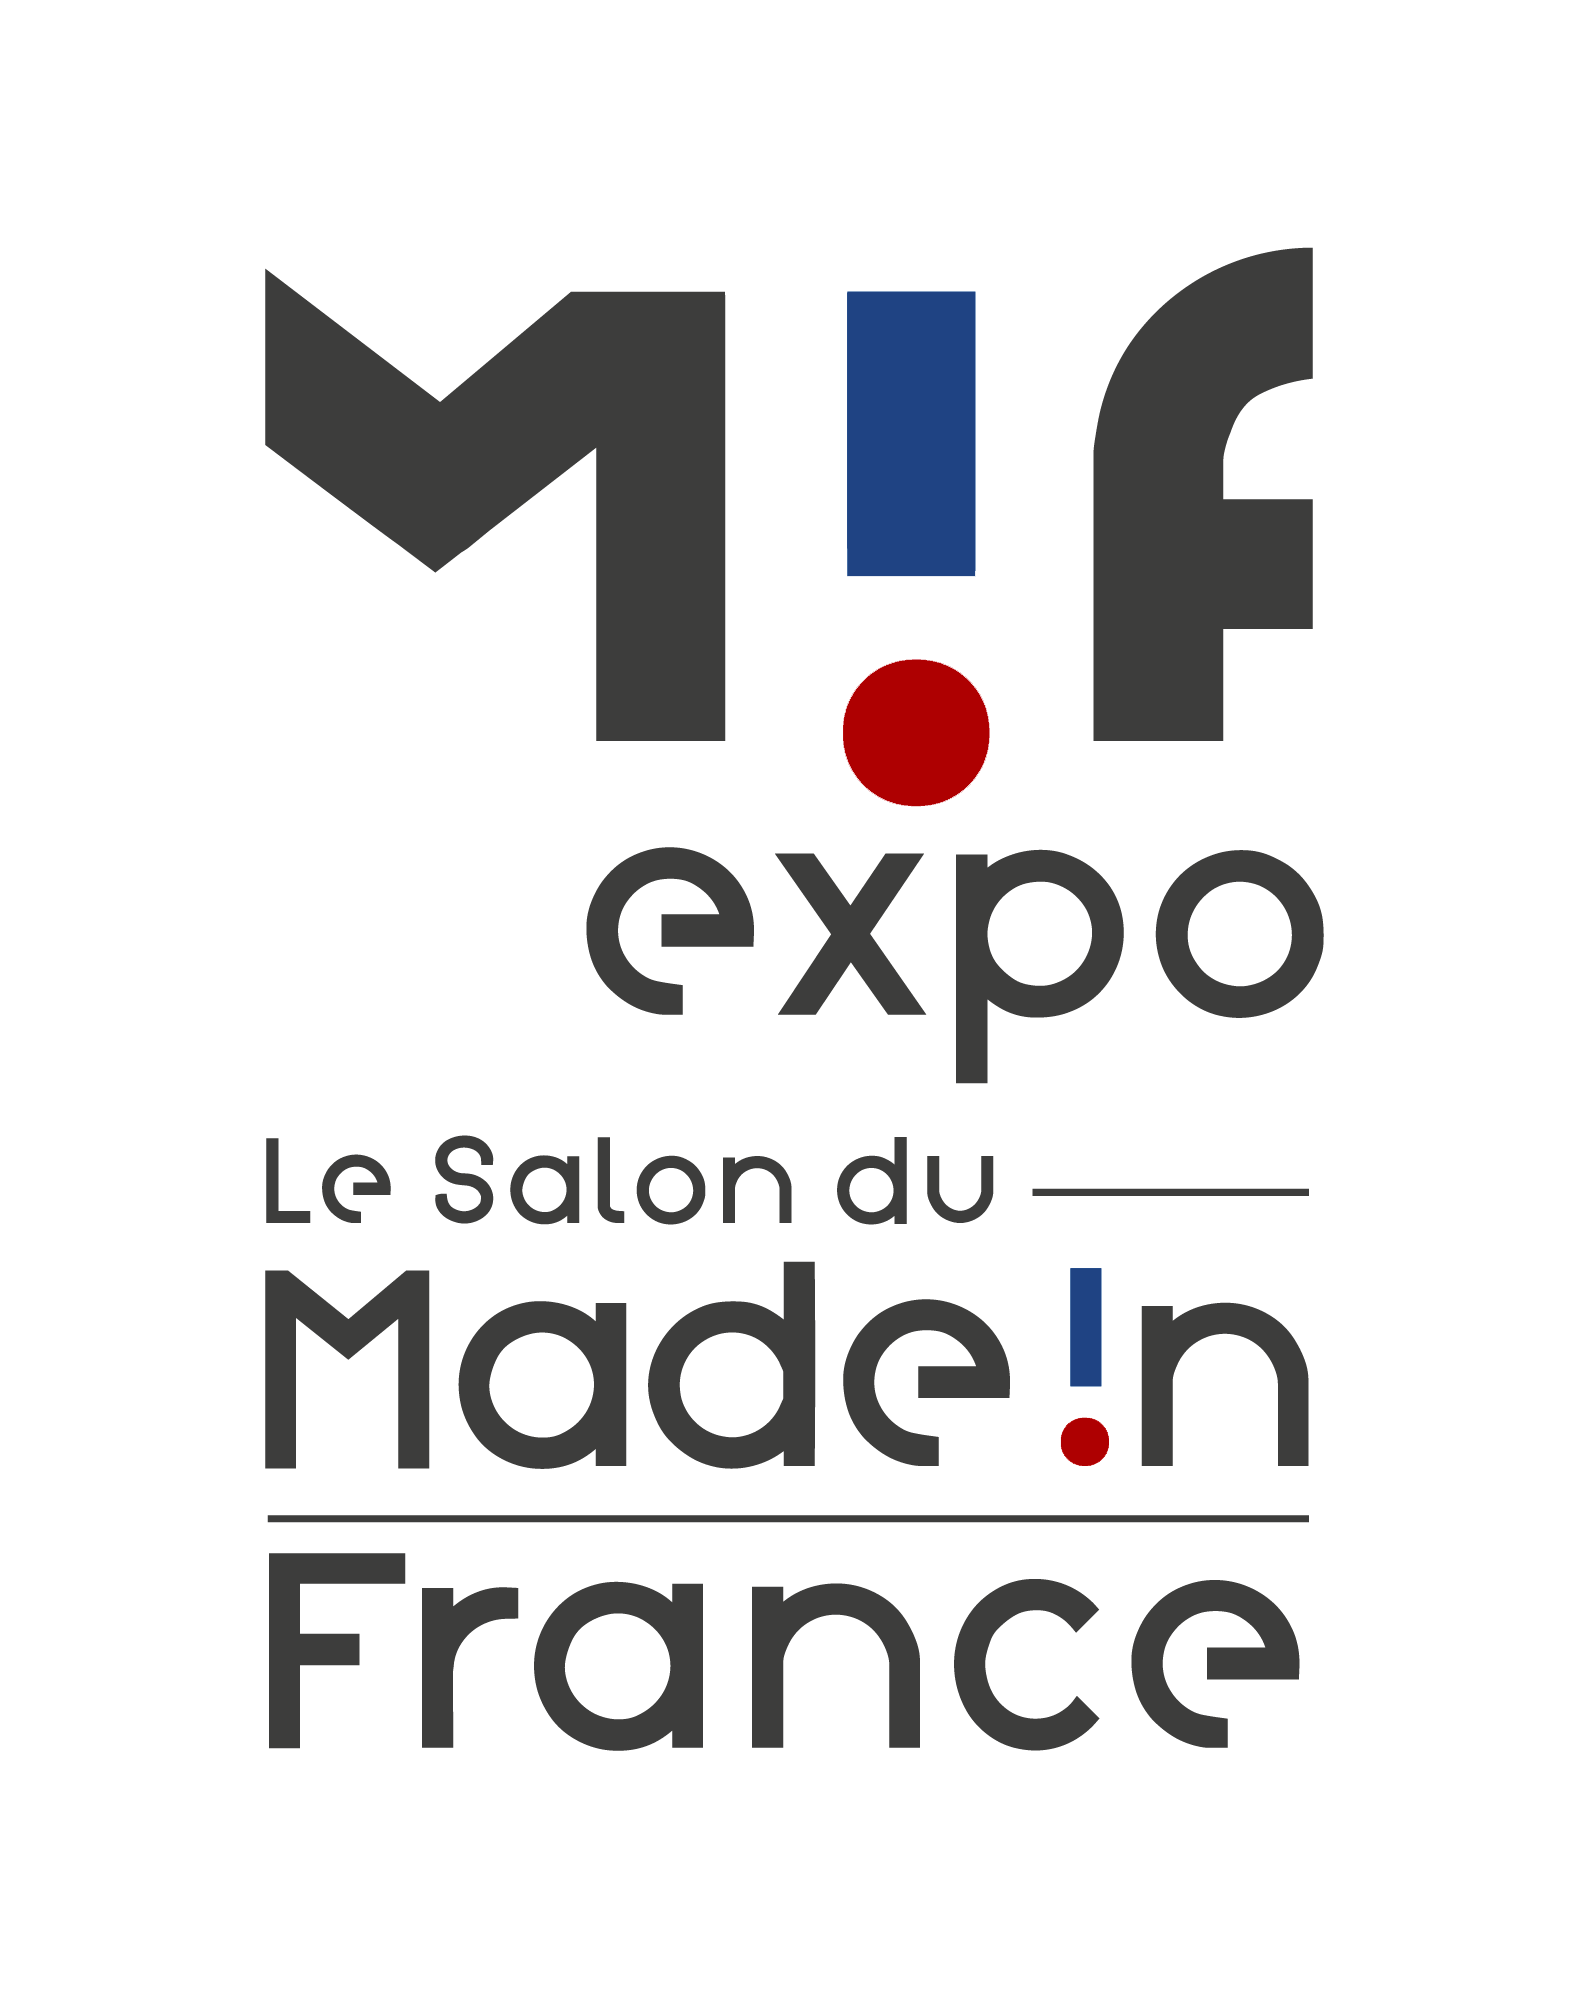 Papeterie de Bessé-sur-Braye Salon Made In France